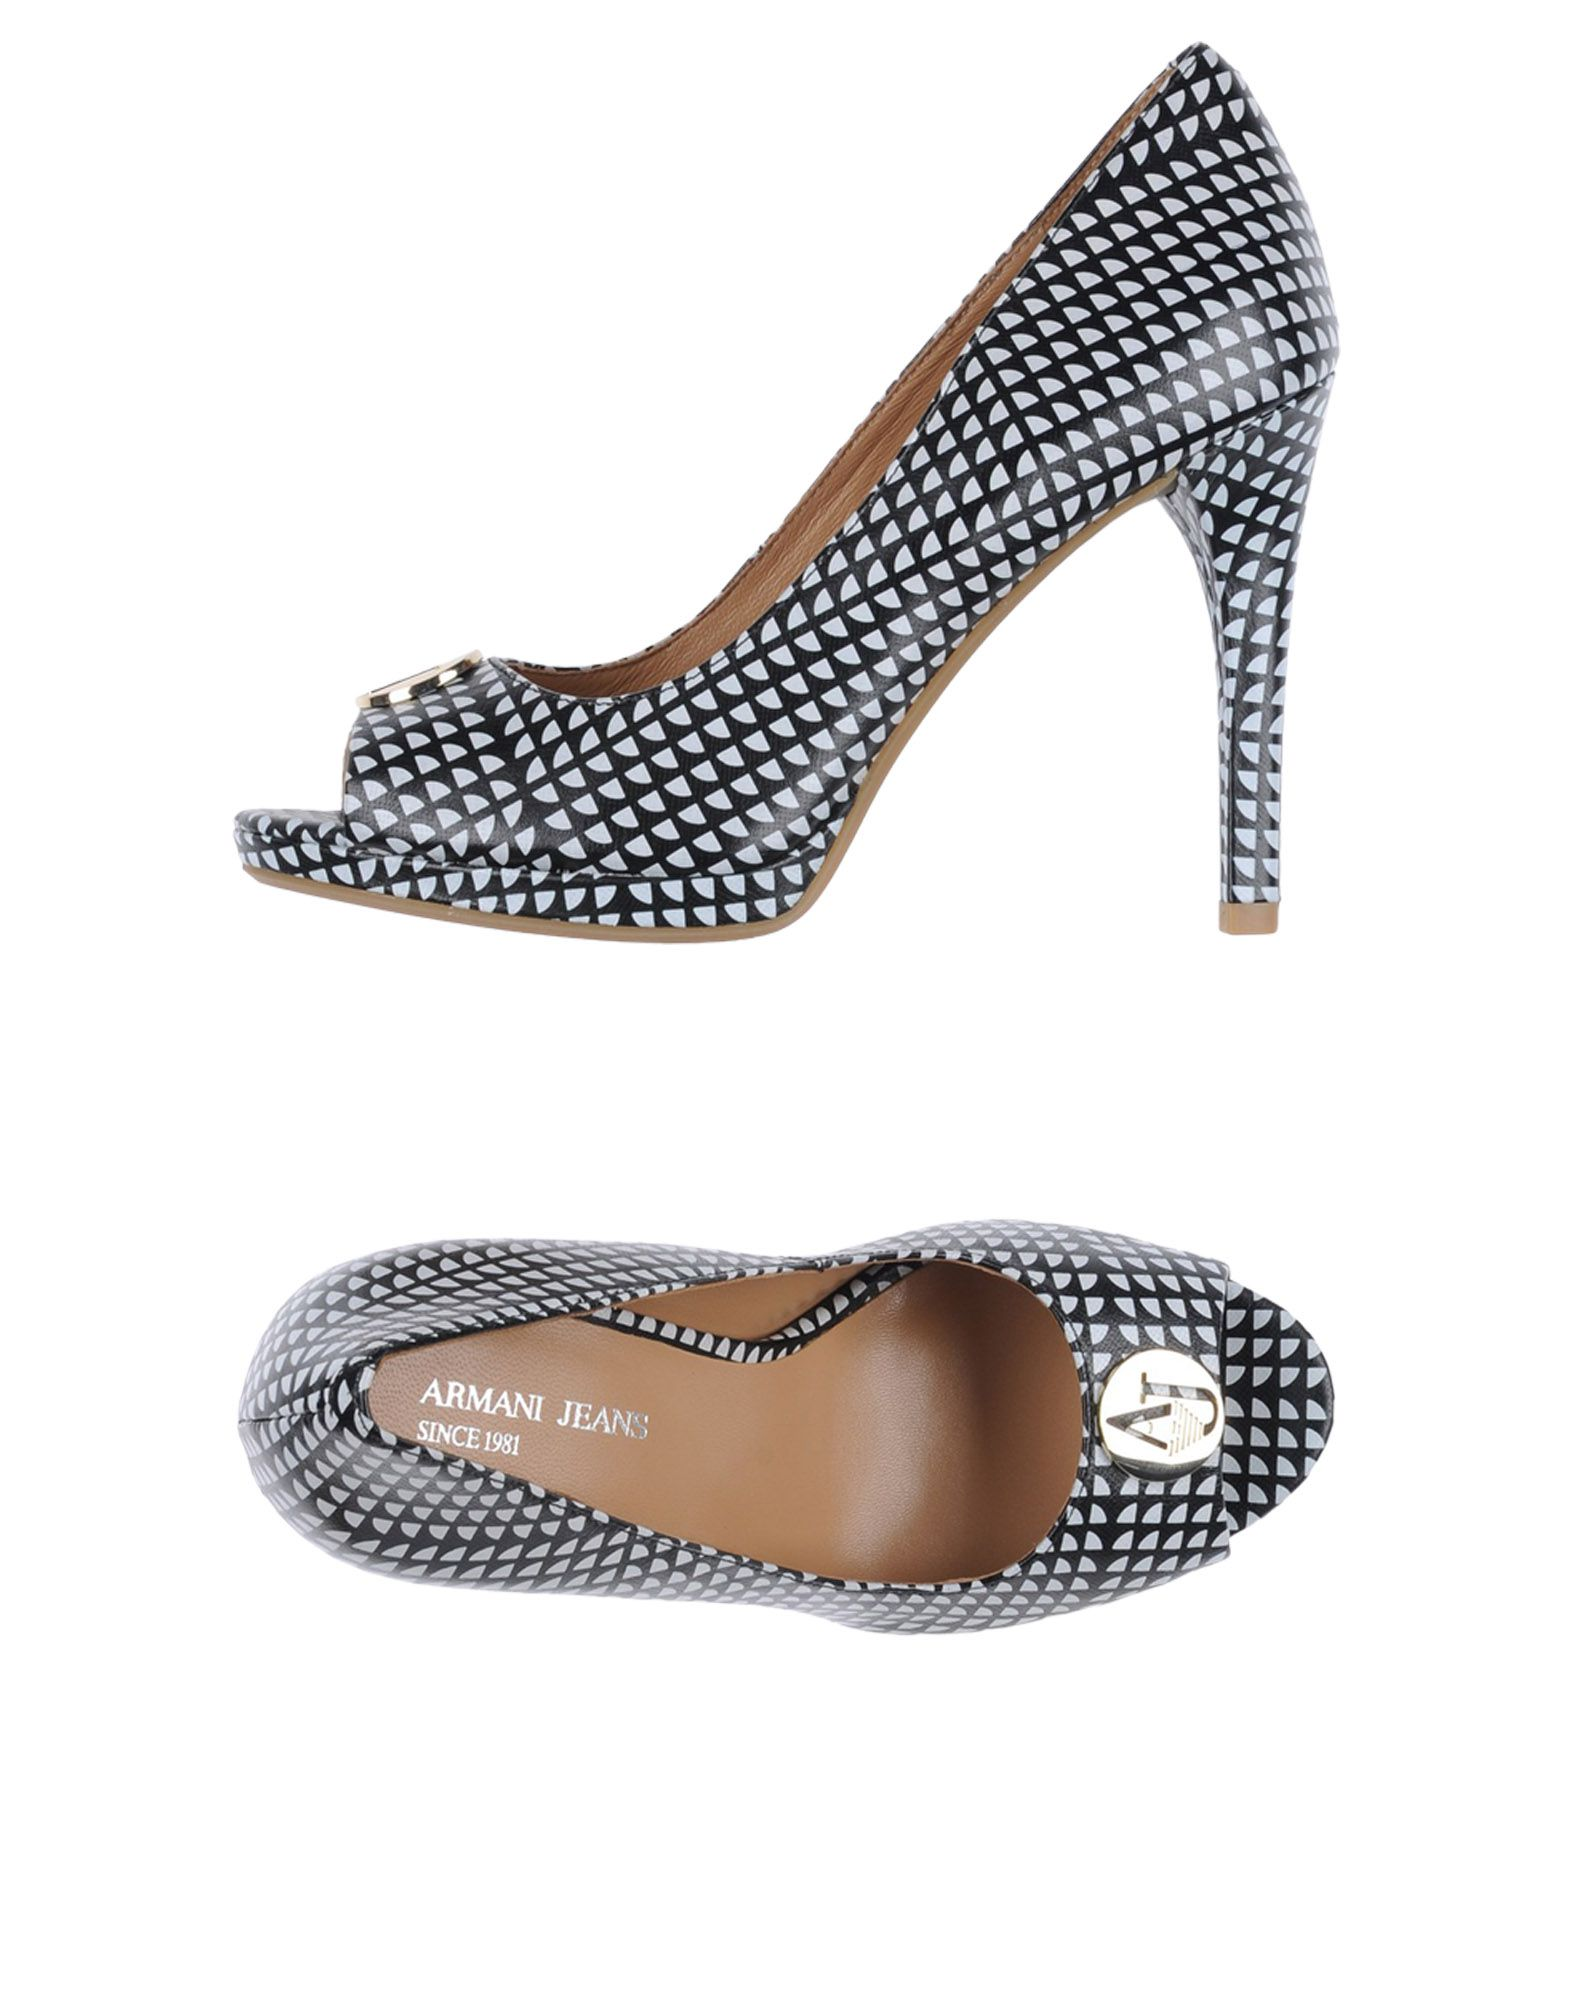 Stilvolle billige Schuhe Armani Jeans Pumps Damen  11173611VK